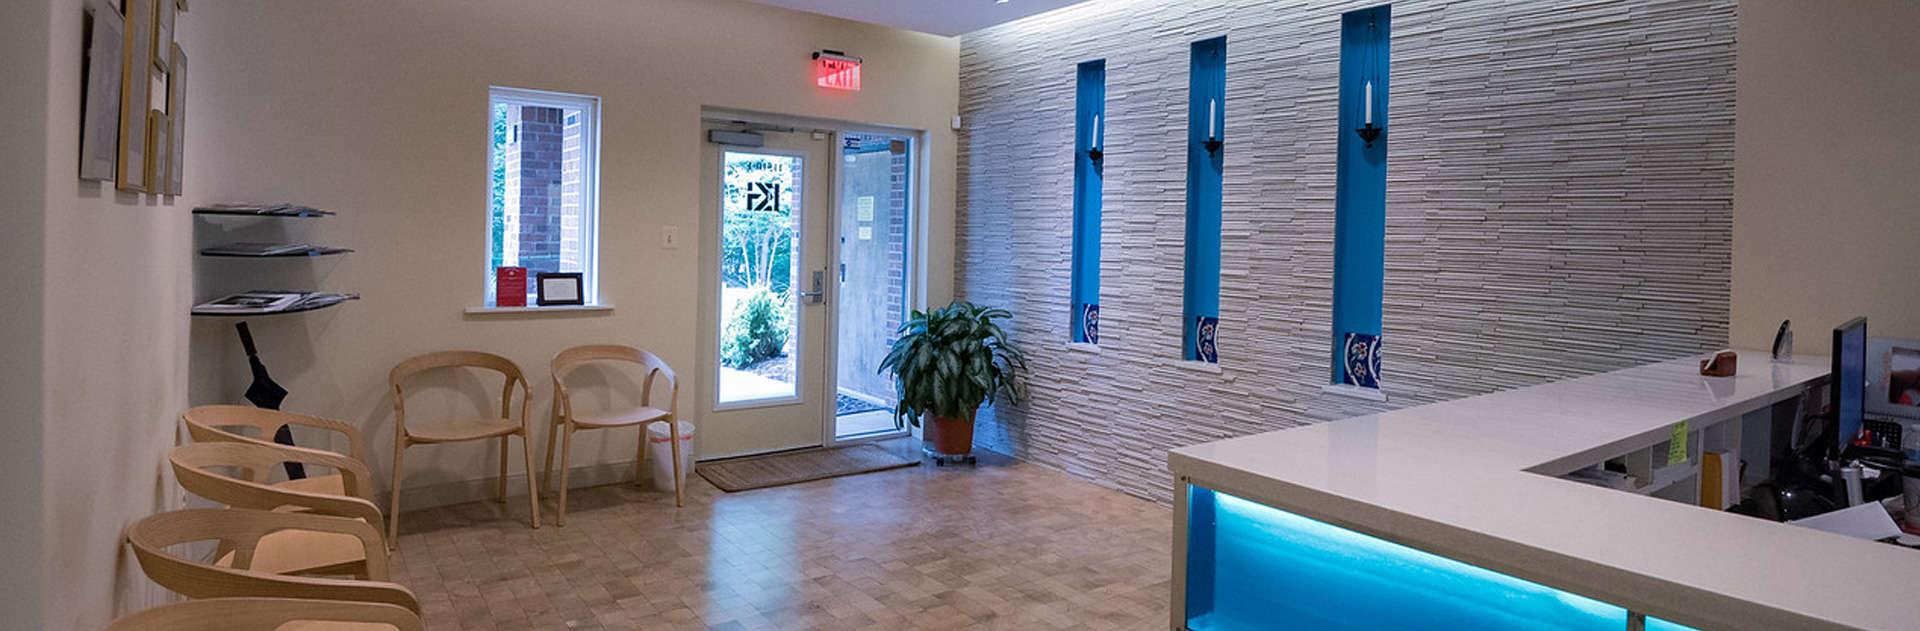 orthodontic waiting room